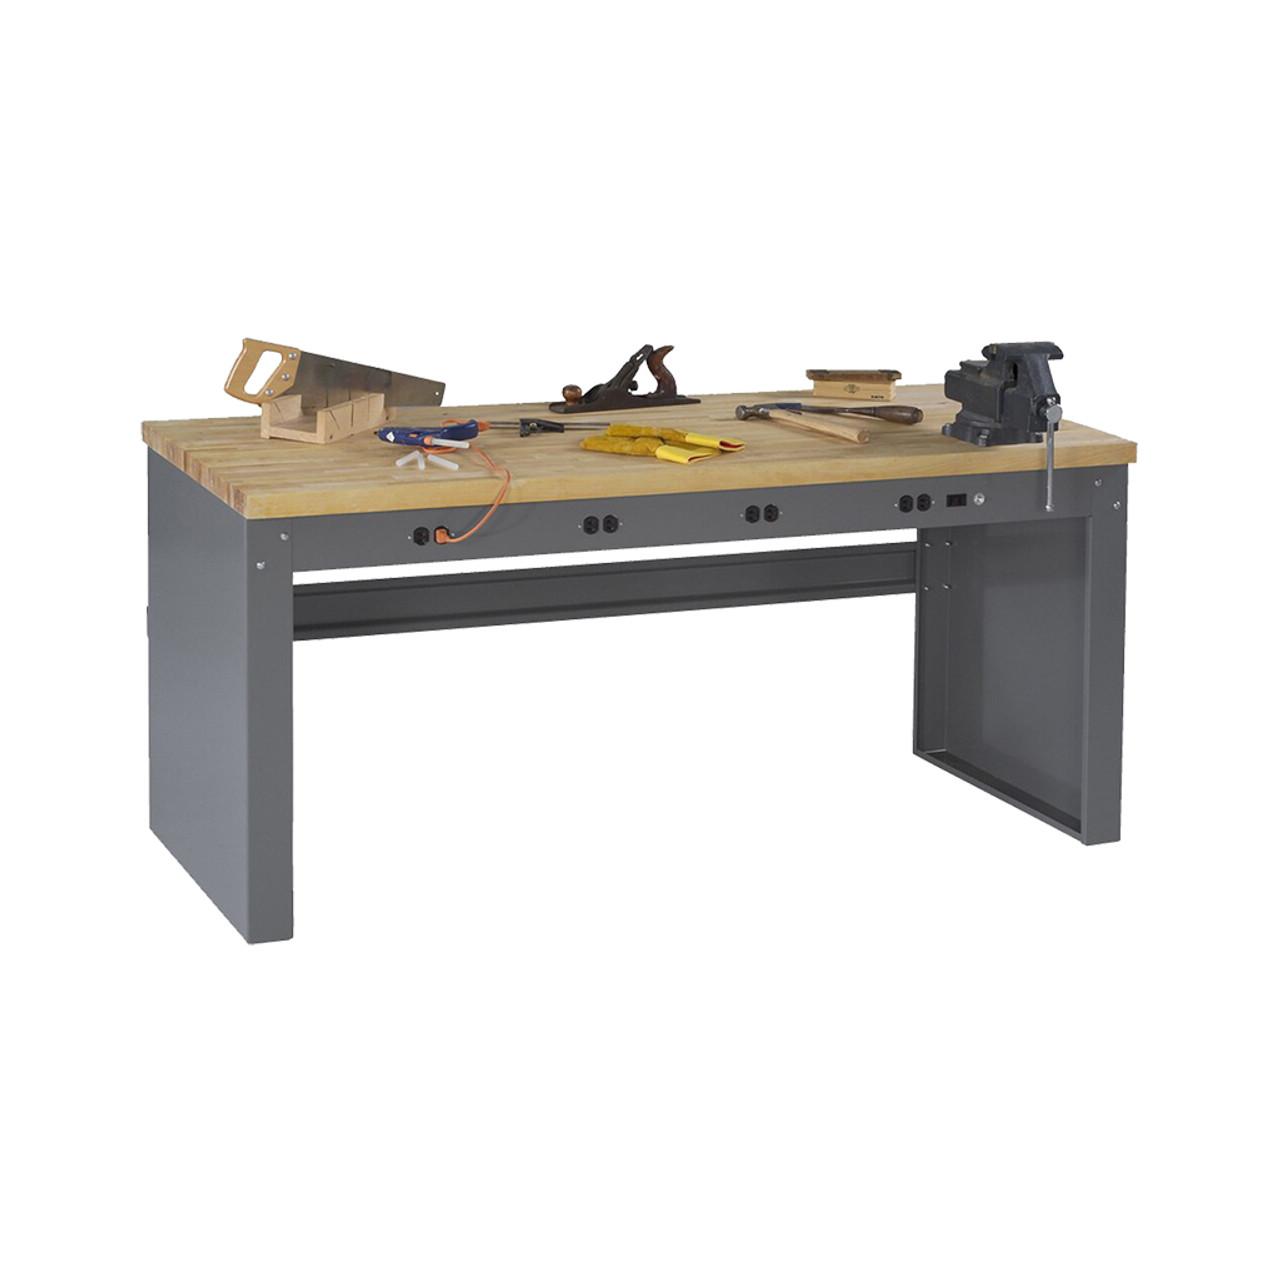 Wondrous Tennsco Electronics Work Bench W Stringer Outlet Panel 6W X 36D X 33 3 4H Maple Laminate Top Ibusinesslaw Wood Chair Design Ideas Ibusinesslaworg